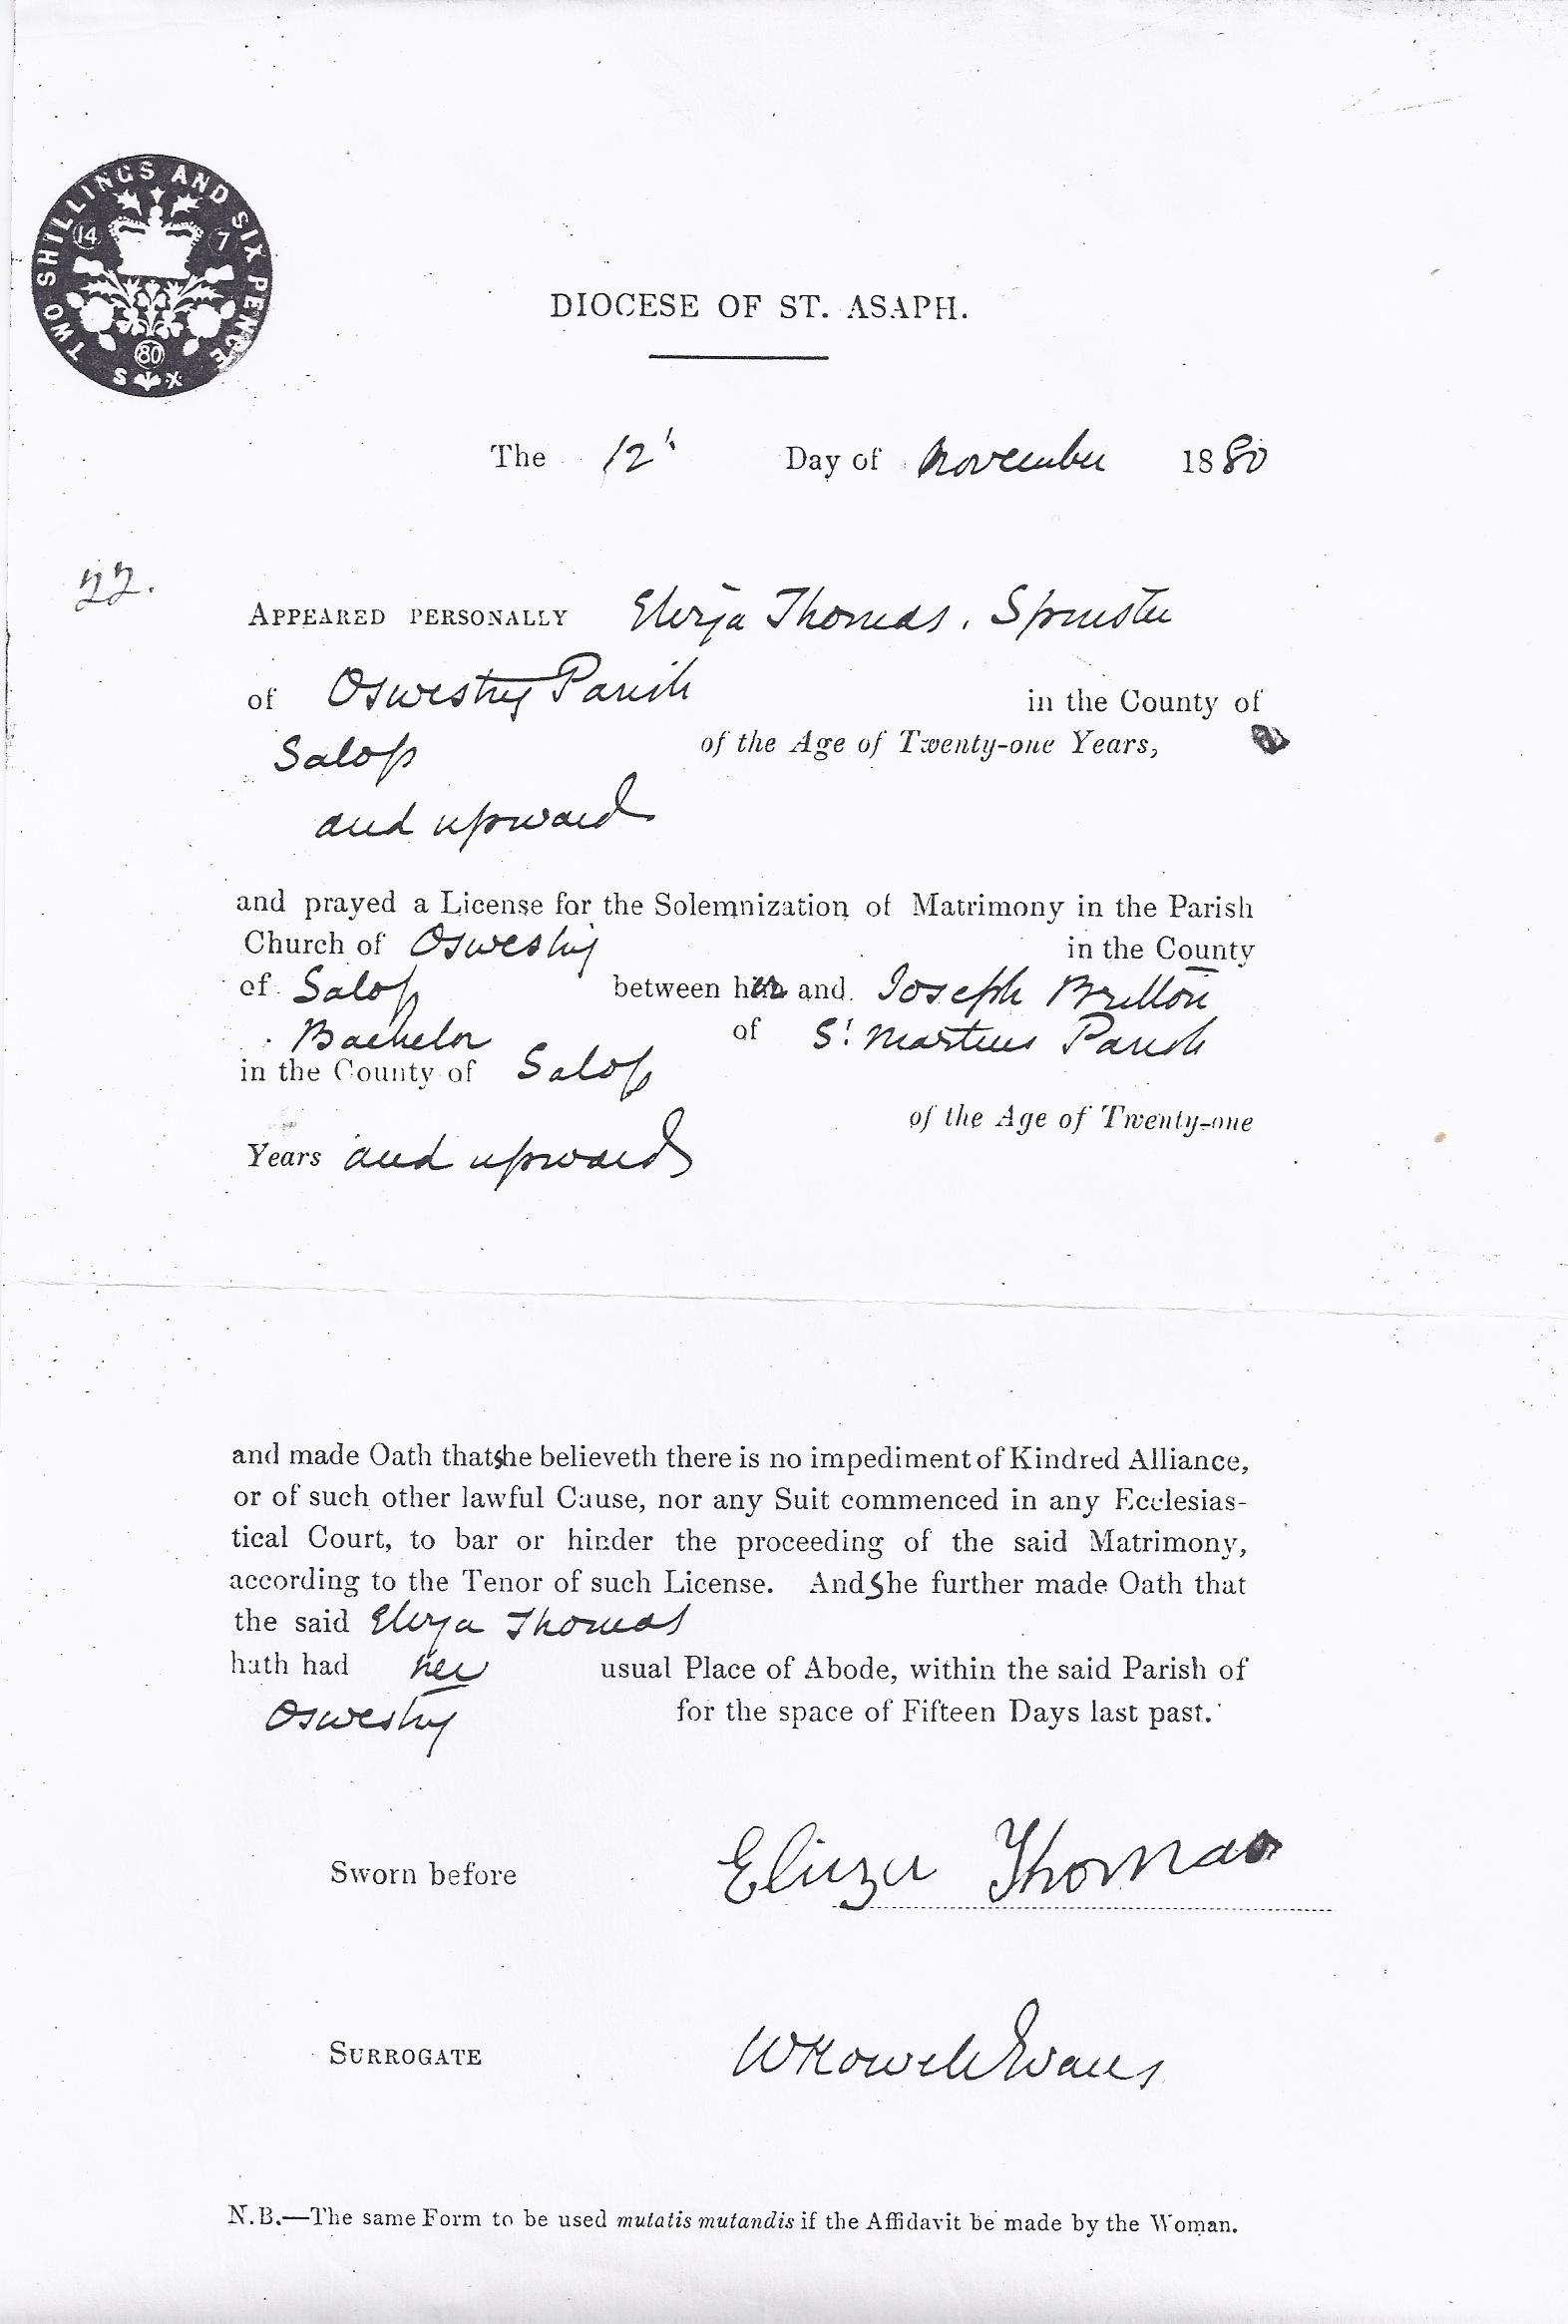 Marriage Licence for Joseph Britton and Eliza Thomas